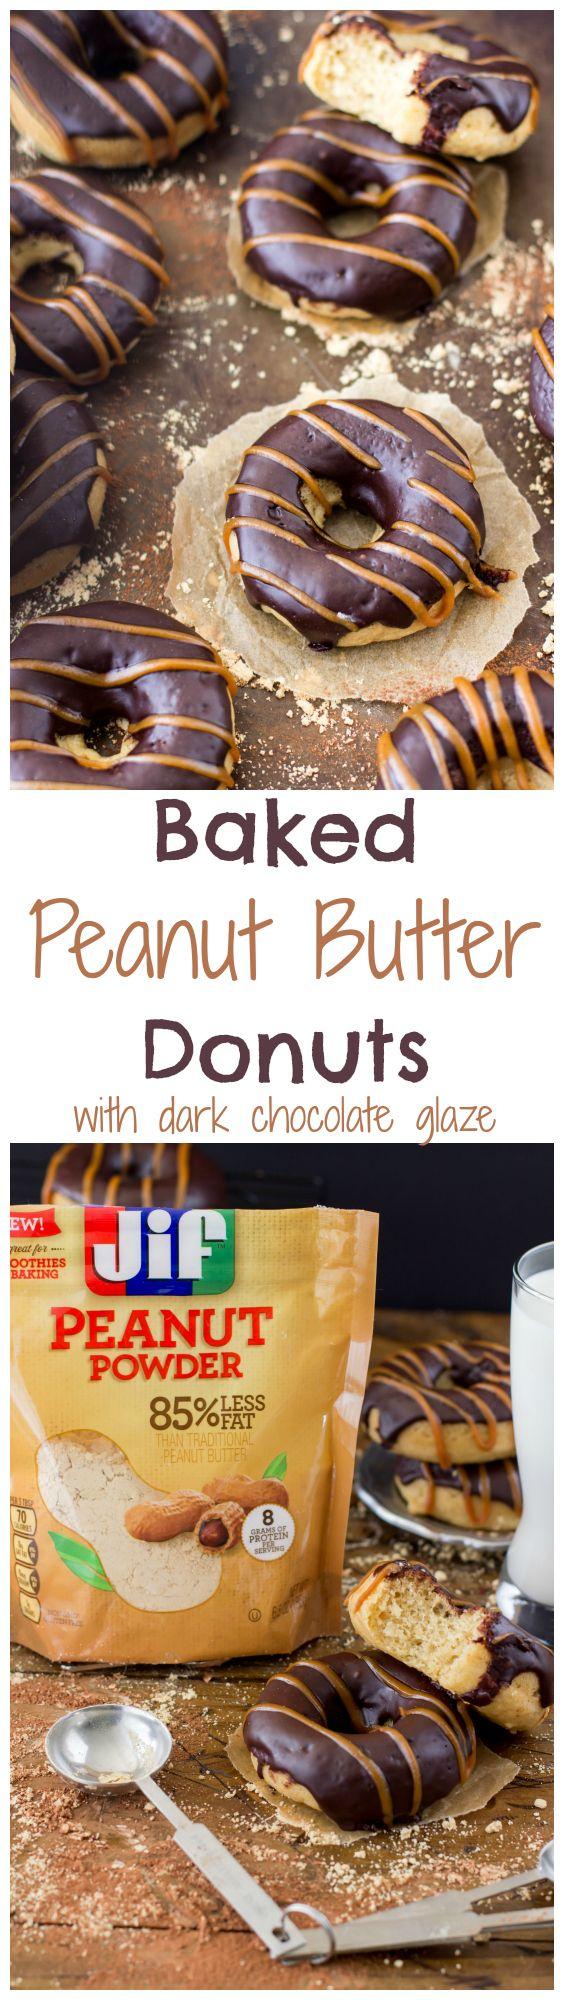 Baked Peanut Butter Donuts made with Jif Peanut Powder #StartWithJifPowder #ad -- SugarSpunRun.com